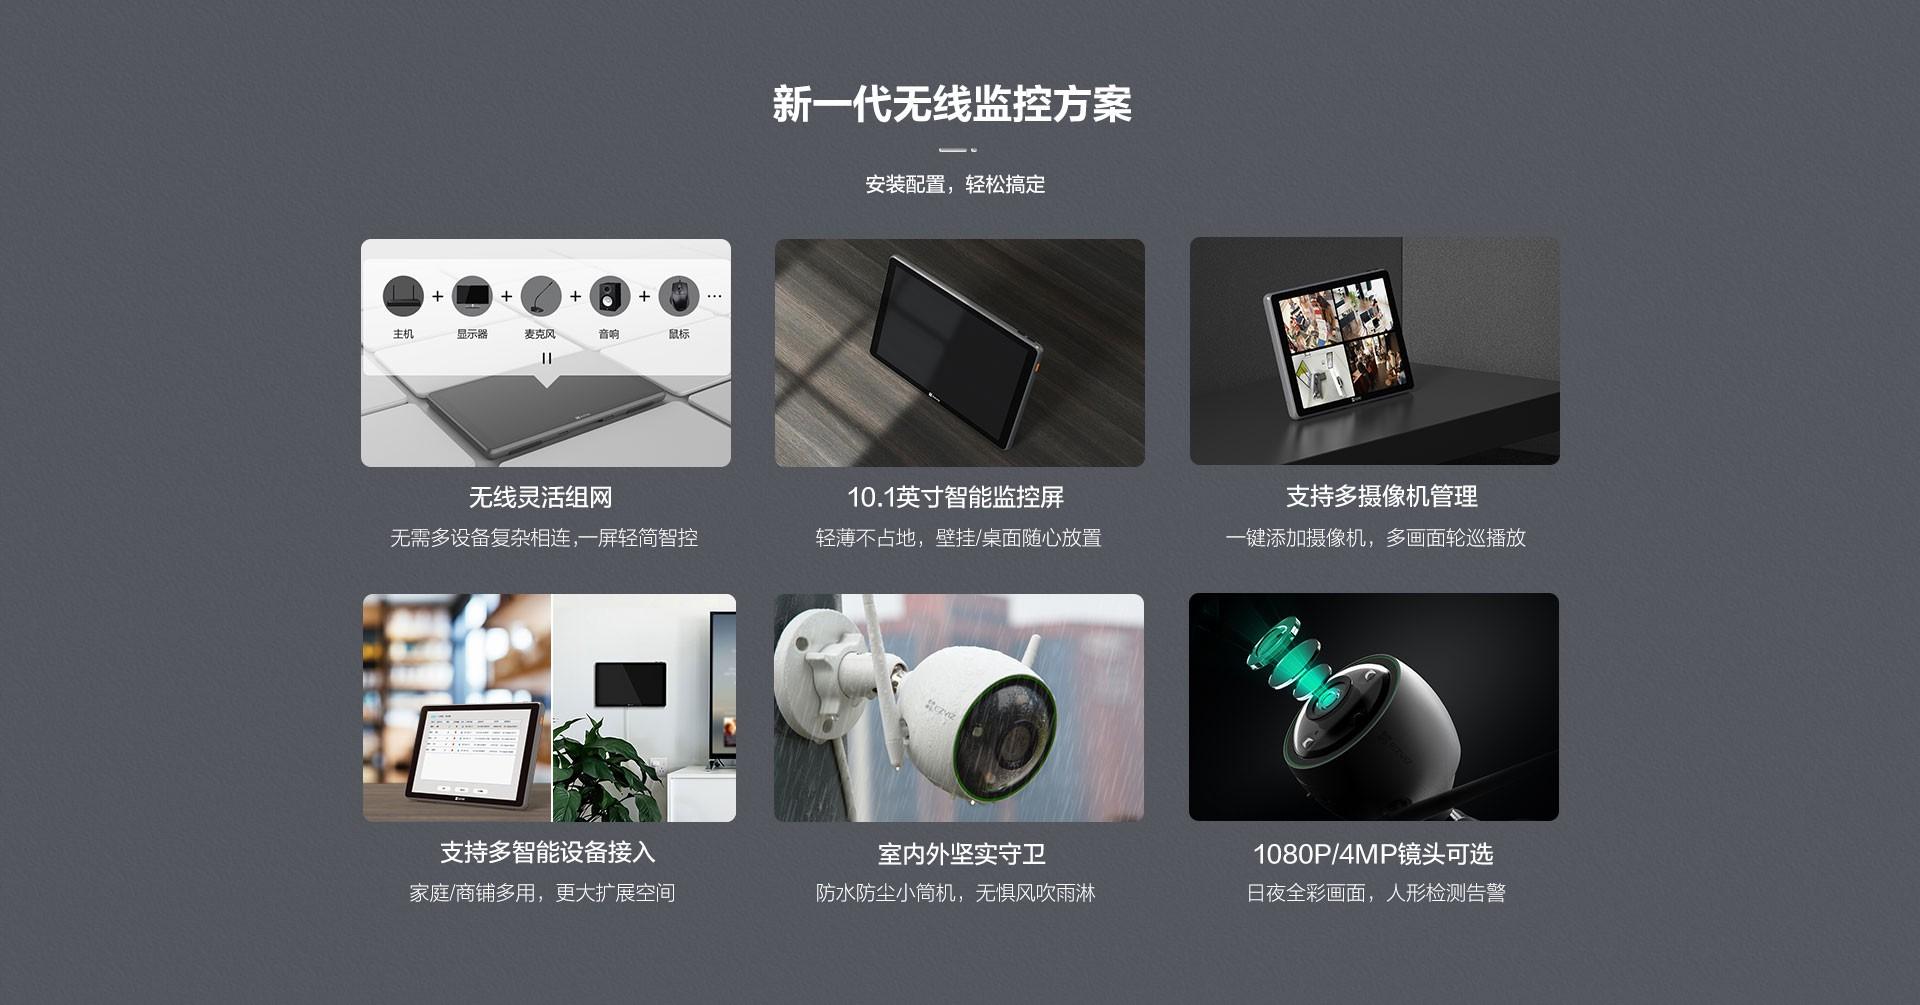 C3C+智能屏+卡套装-web_02.jpg